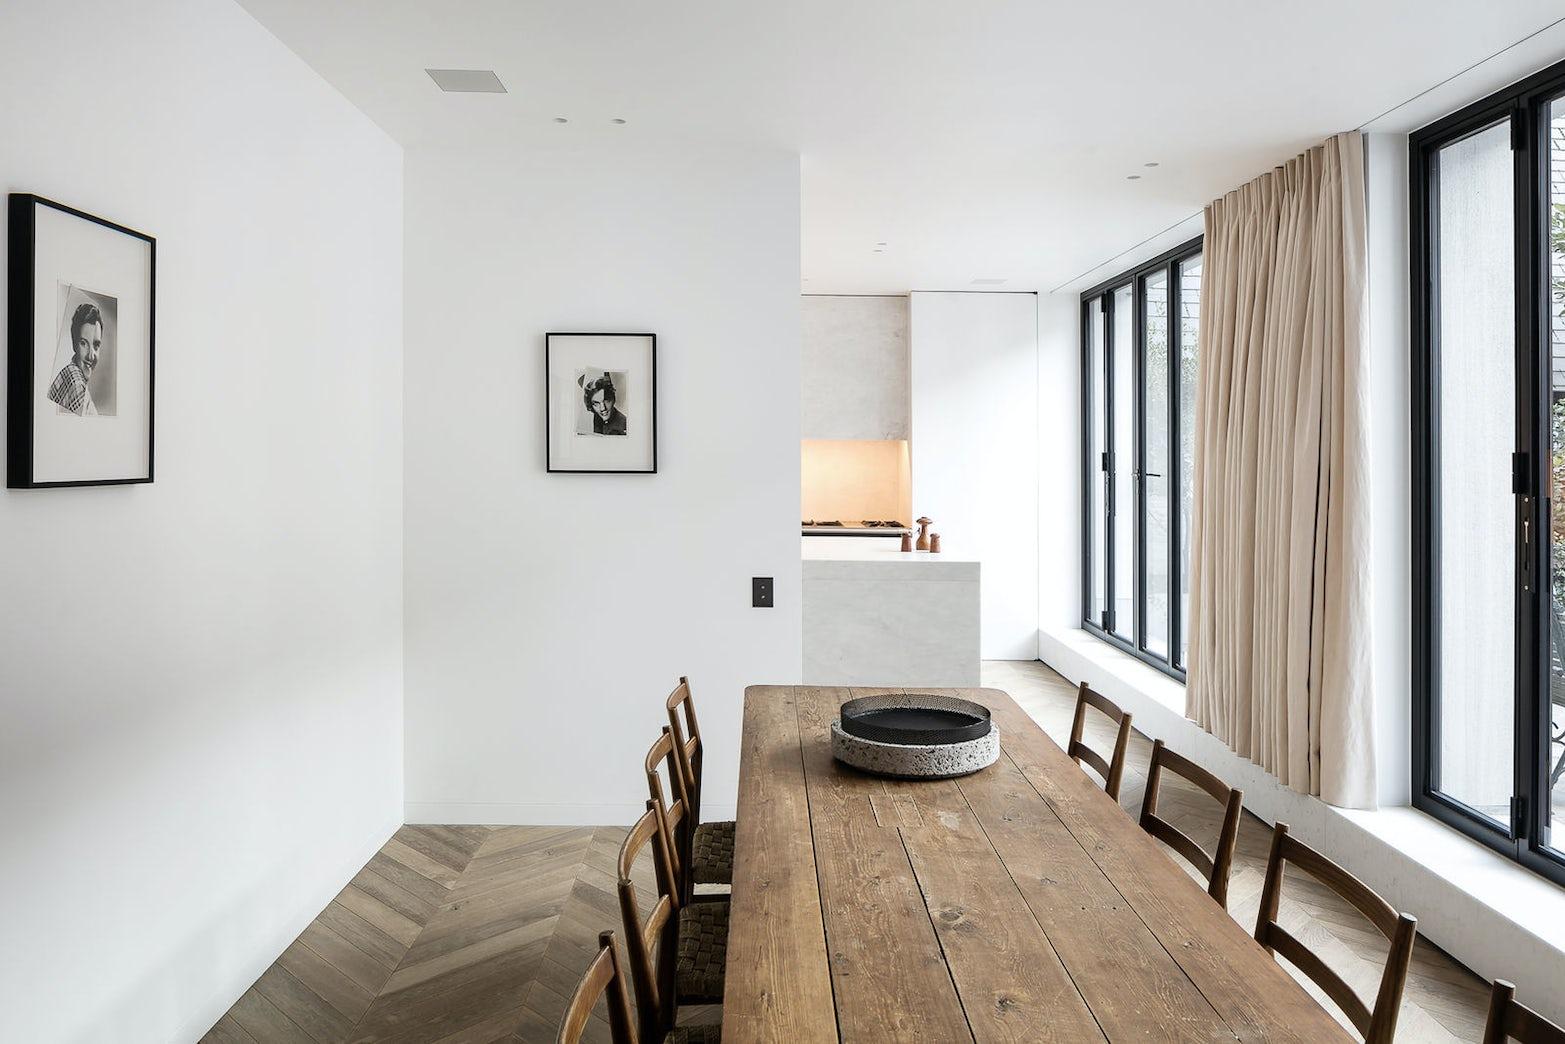 Nicolas-Schuybroek-Spaces-of-Objects-MK-House-1